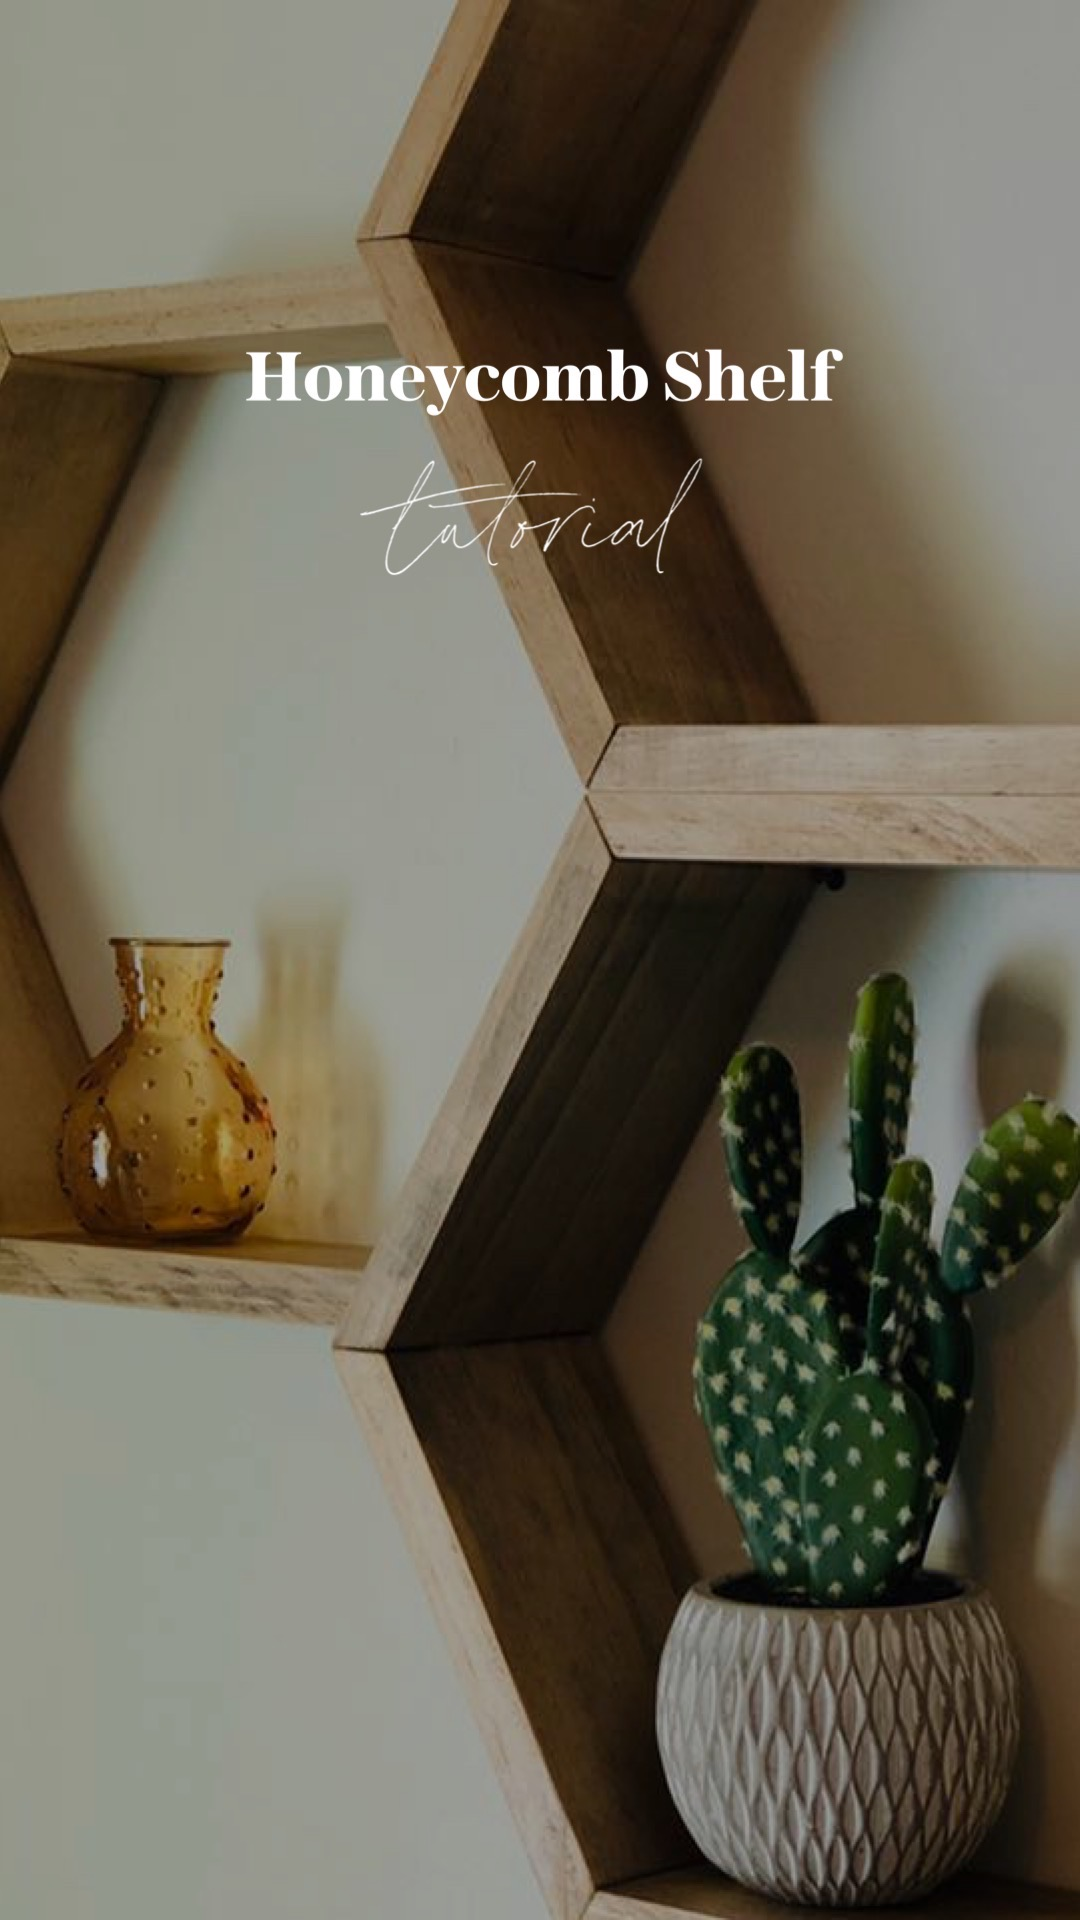 DIY honeycomb shelf tutorial